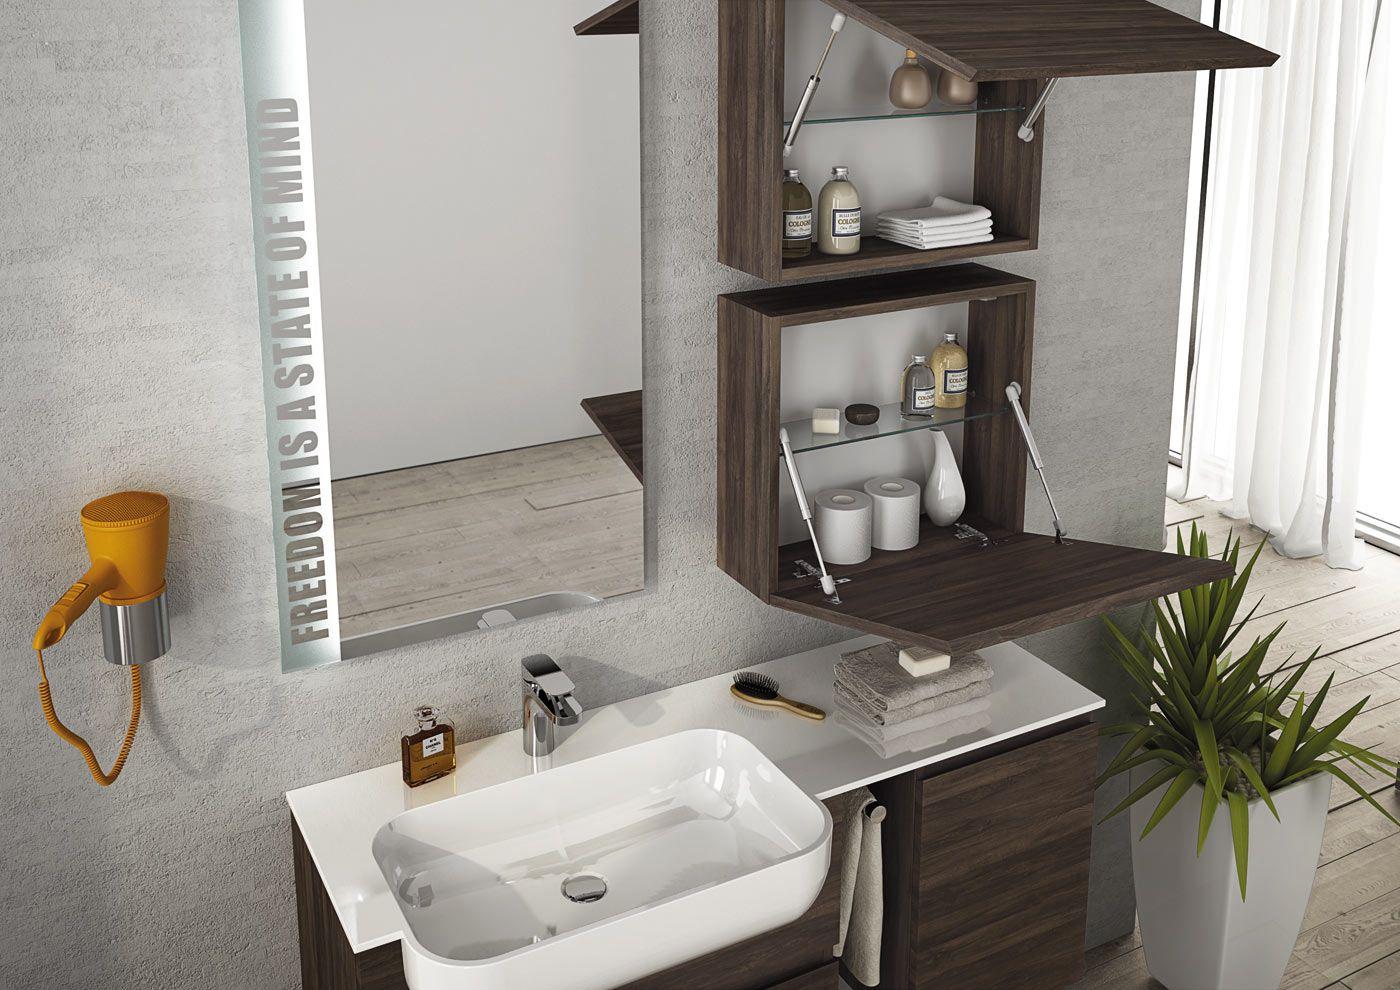 Sottolavello Bagno ~ Arredo mobile bagno street arbi arredobagno mobili arredo